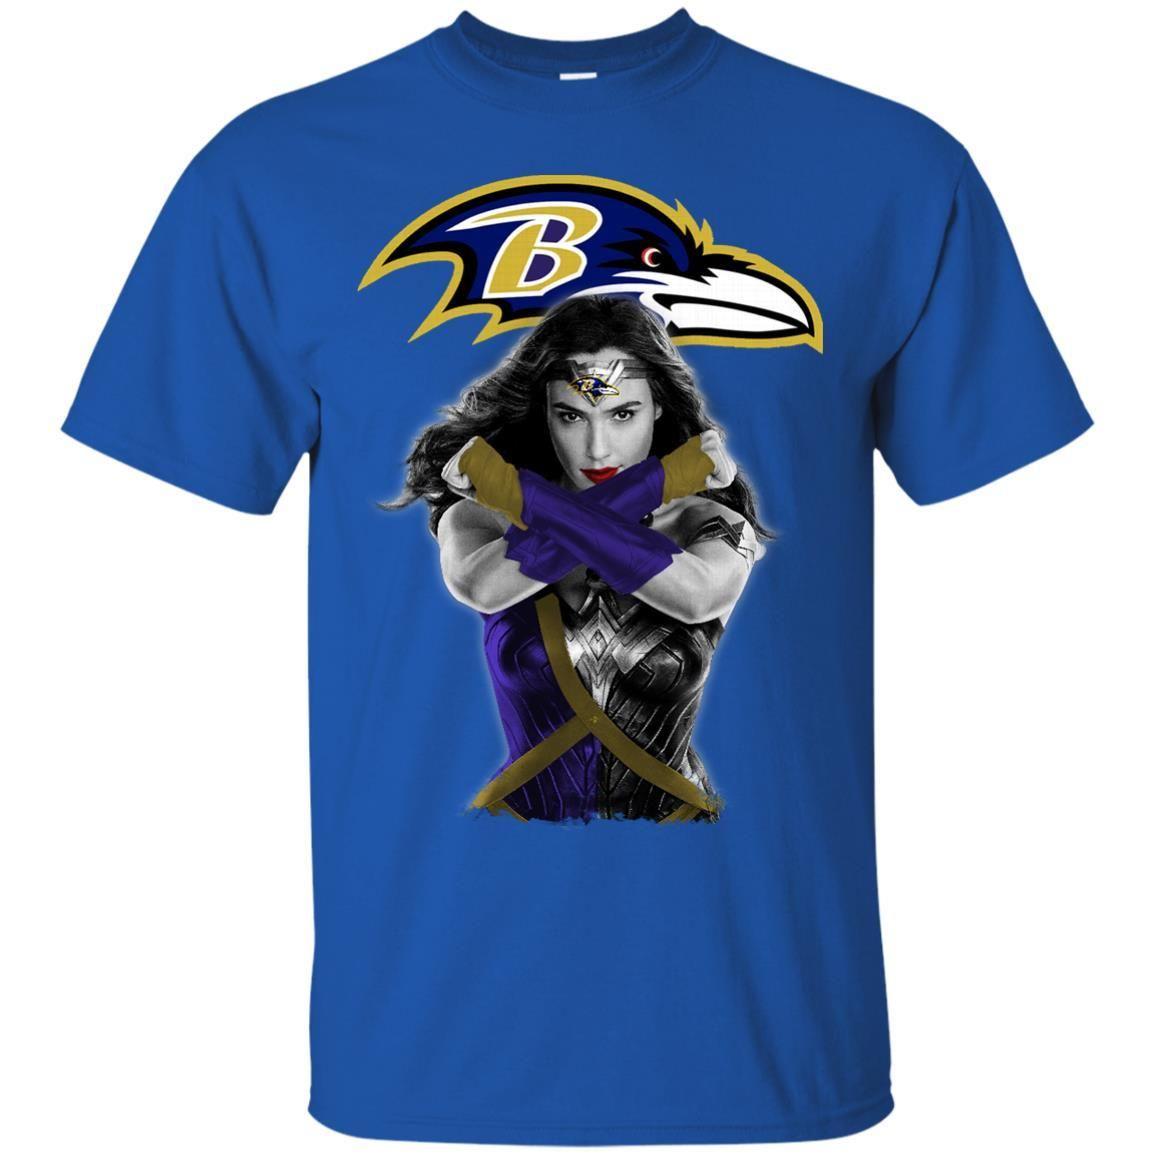 Baltimore Ravens Wonder Woman Women March Women Rights T shirts Hoodies Sweatshirts